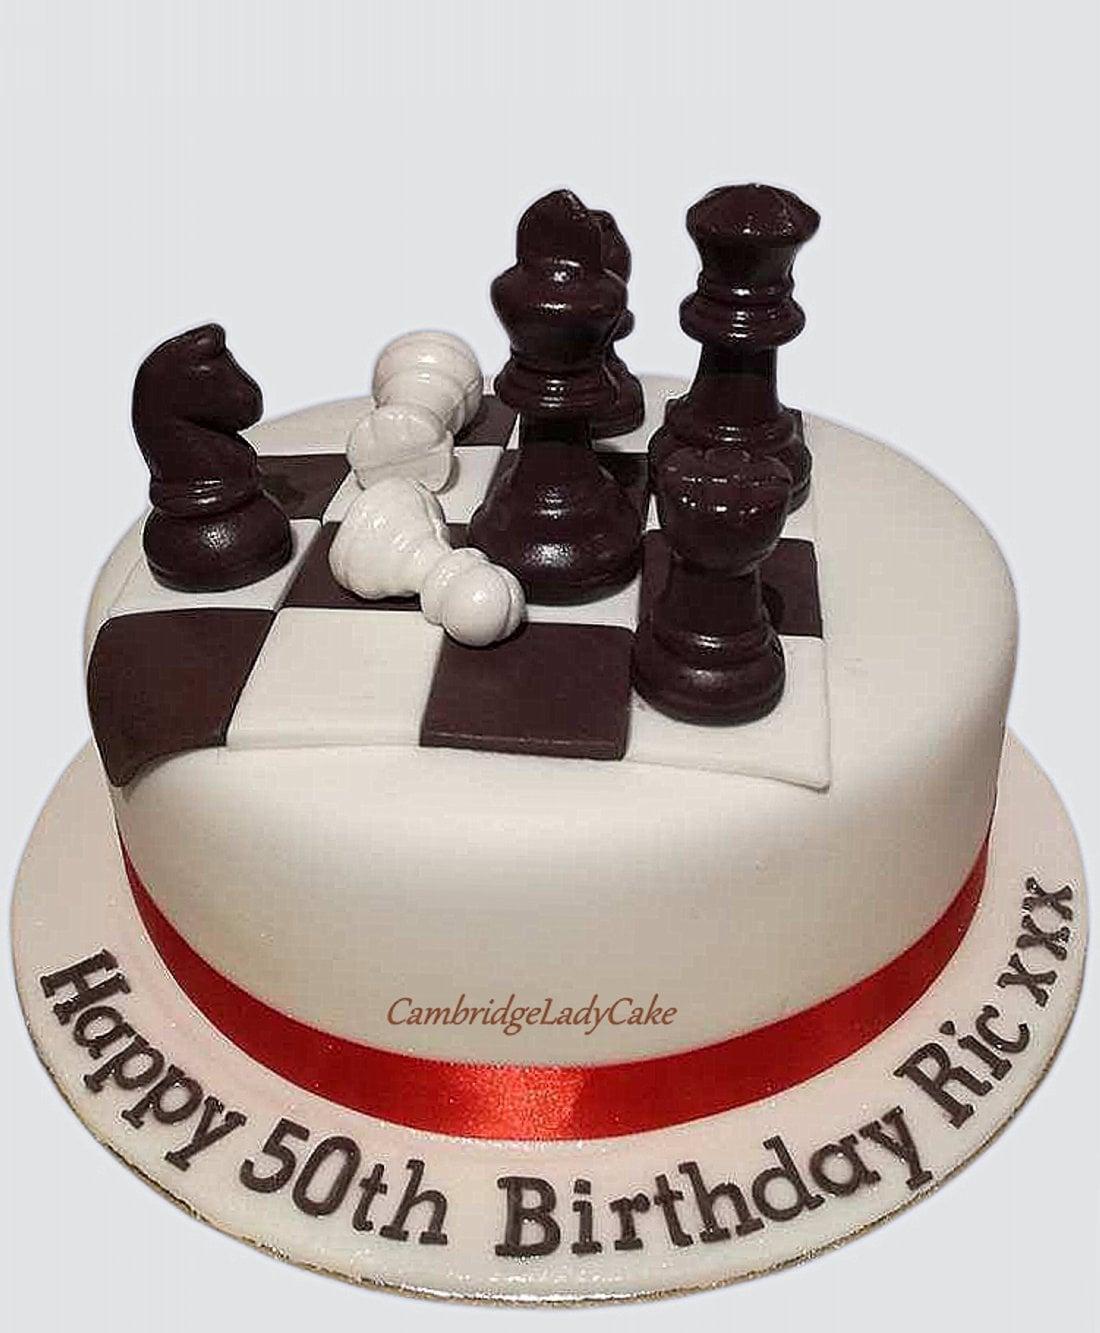 Birthday Cambridge Lady Cake